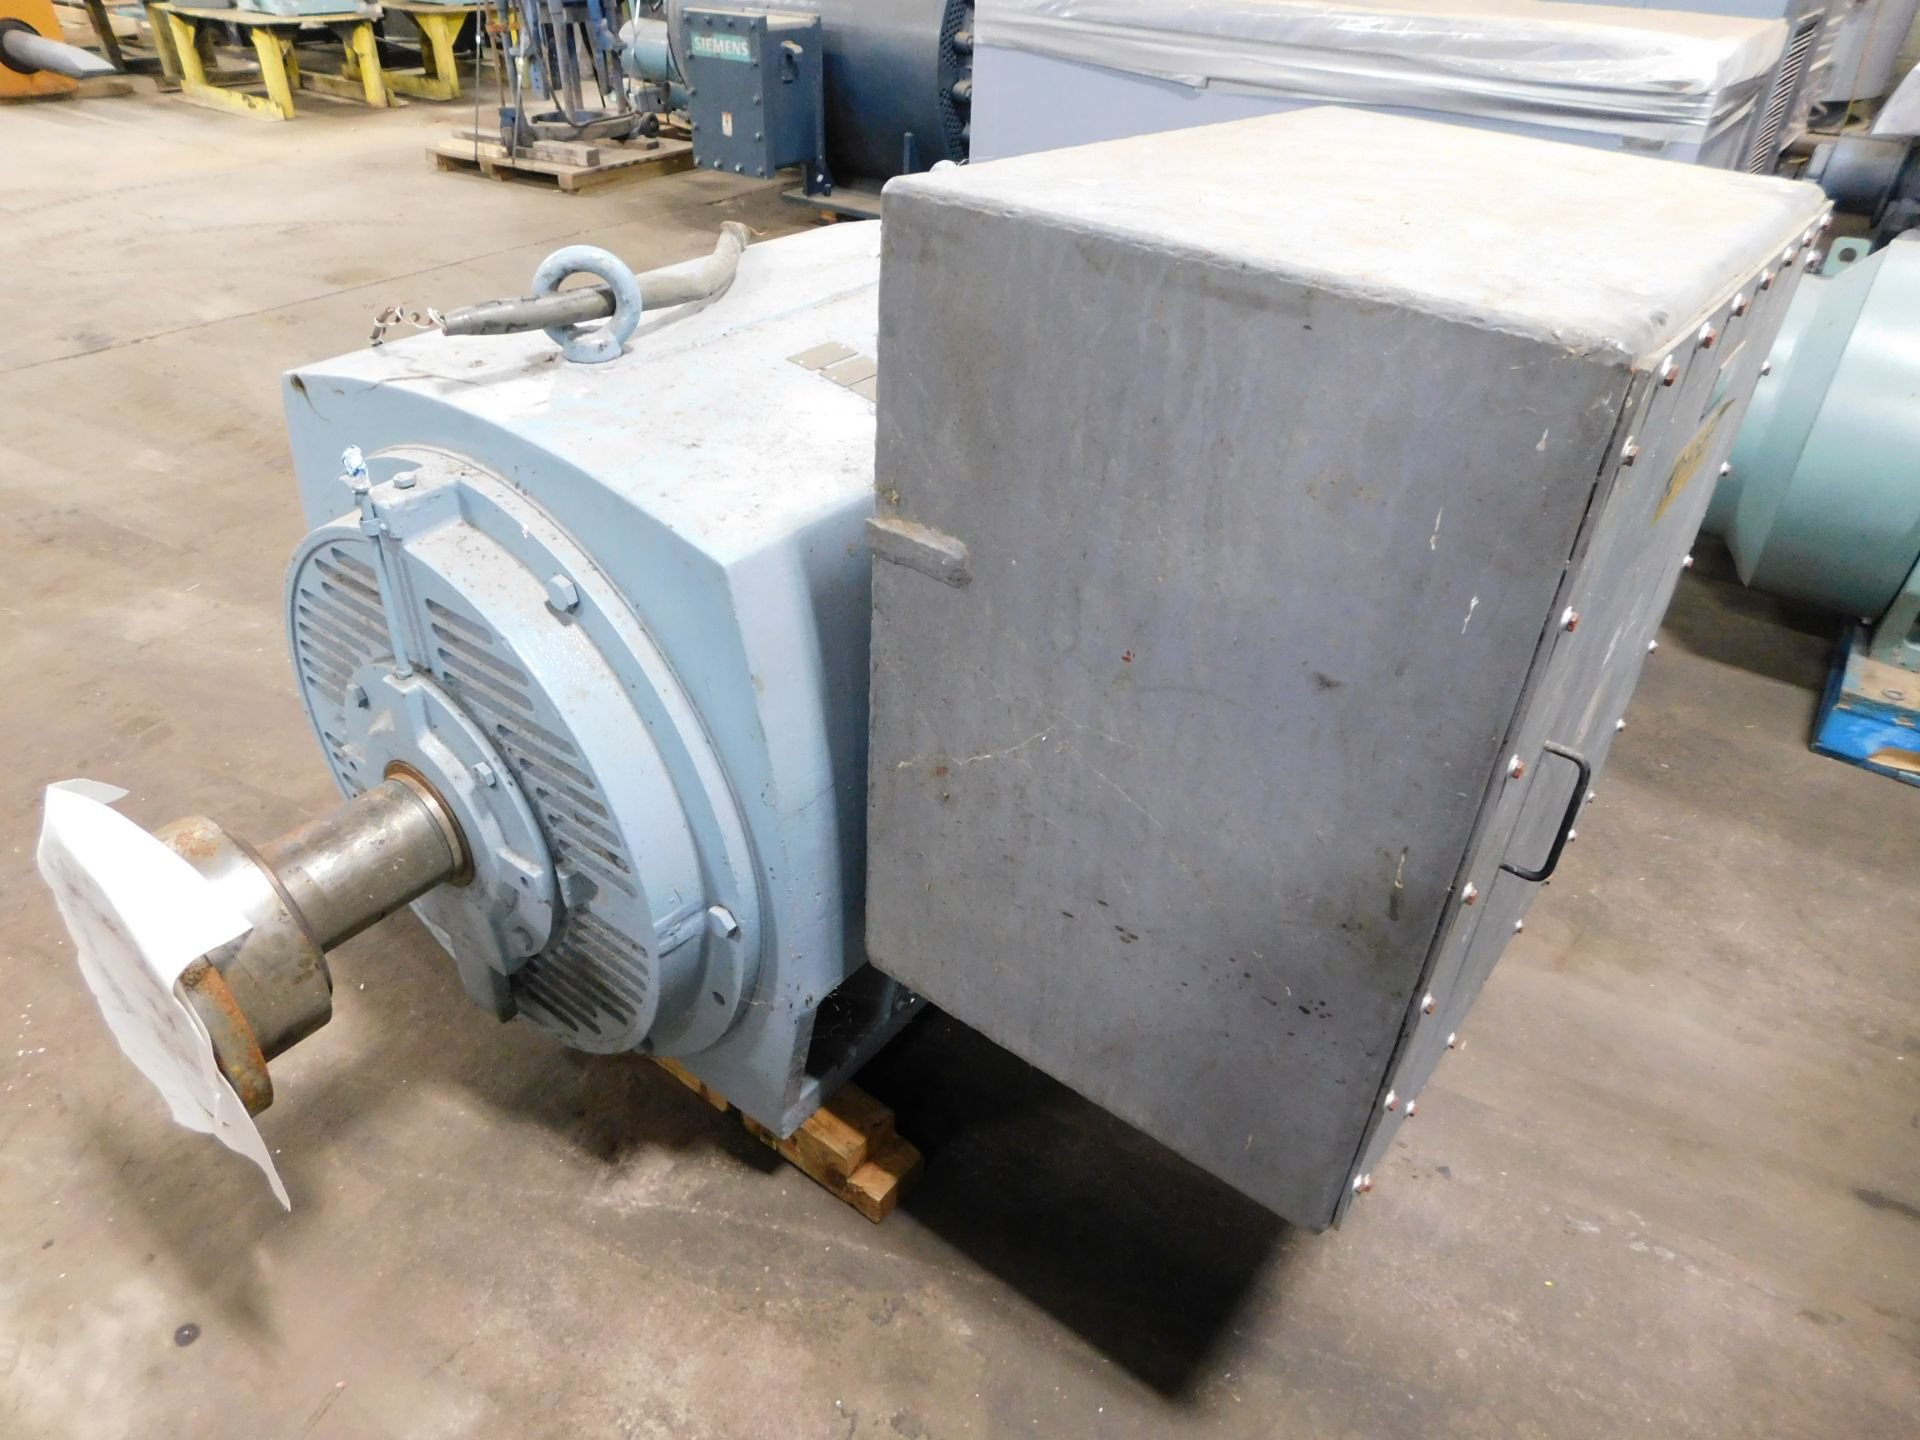 Teco Induction Motor. 600 HP. 3 Ph. 2300/4160 V. 60 Hz. 1780 RPM. 5808B. ASHA-PA001. - Image 2 of 6